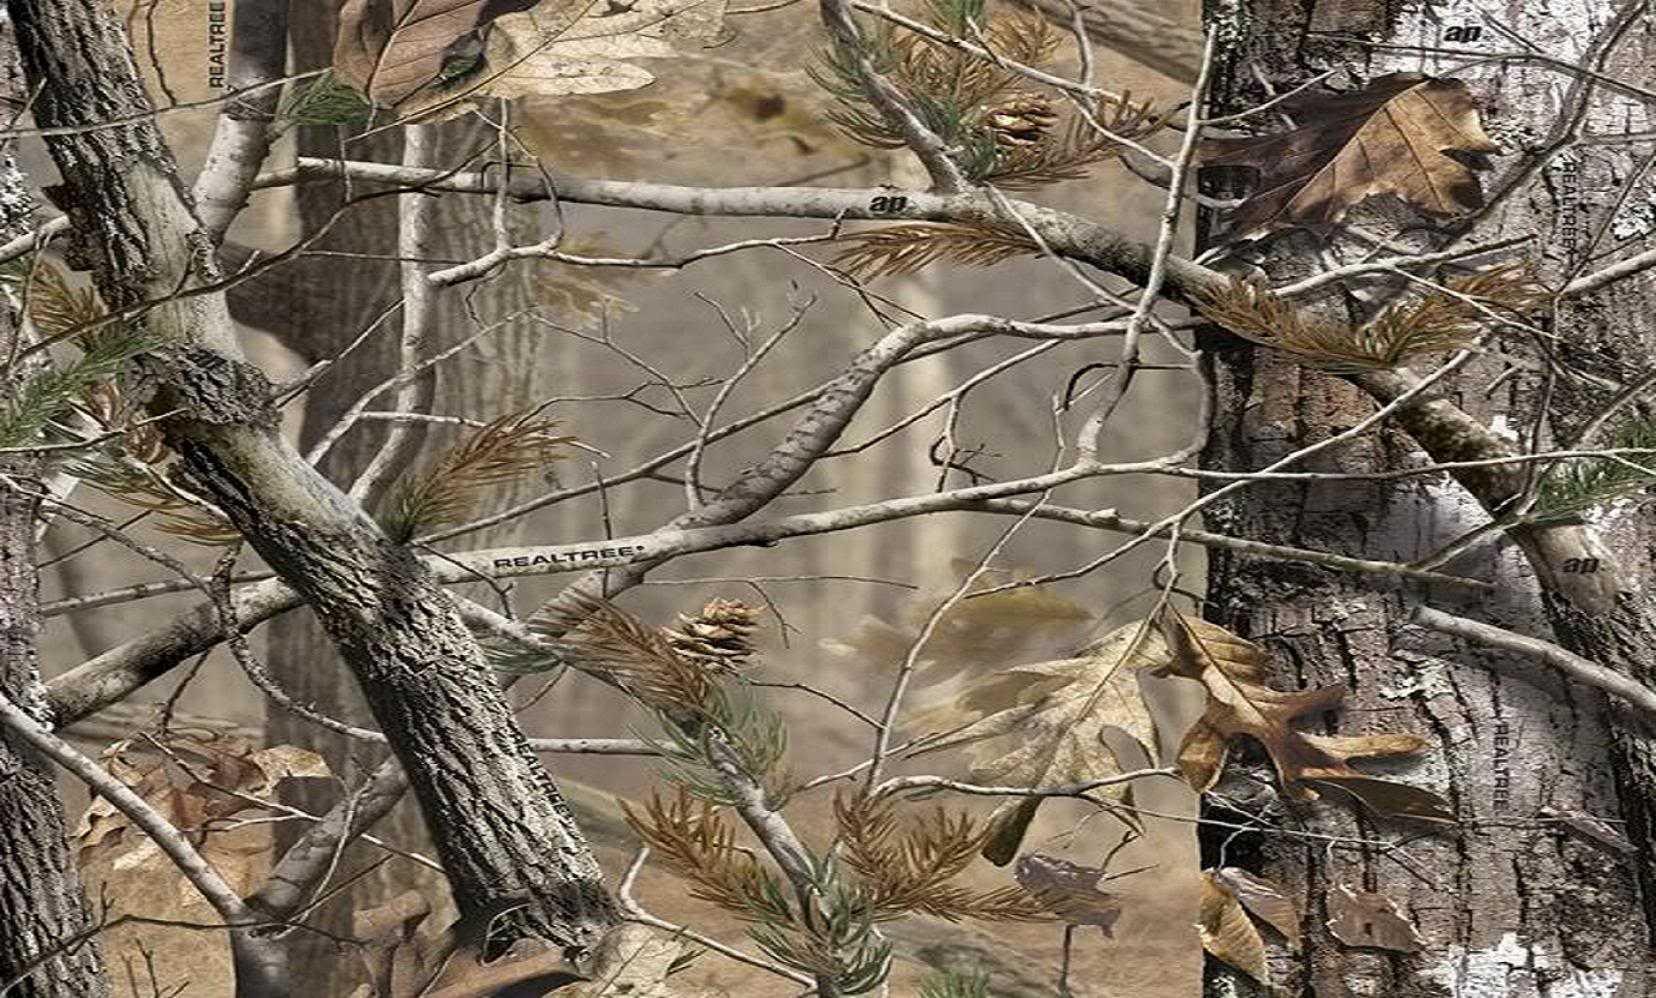 Realtree Wallpapers - Top Free Realtree